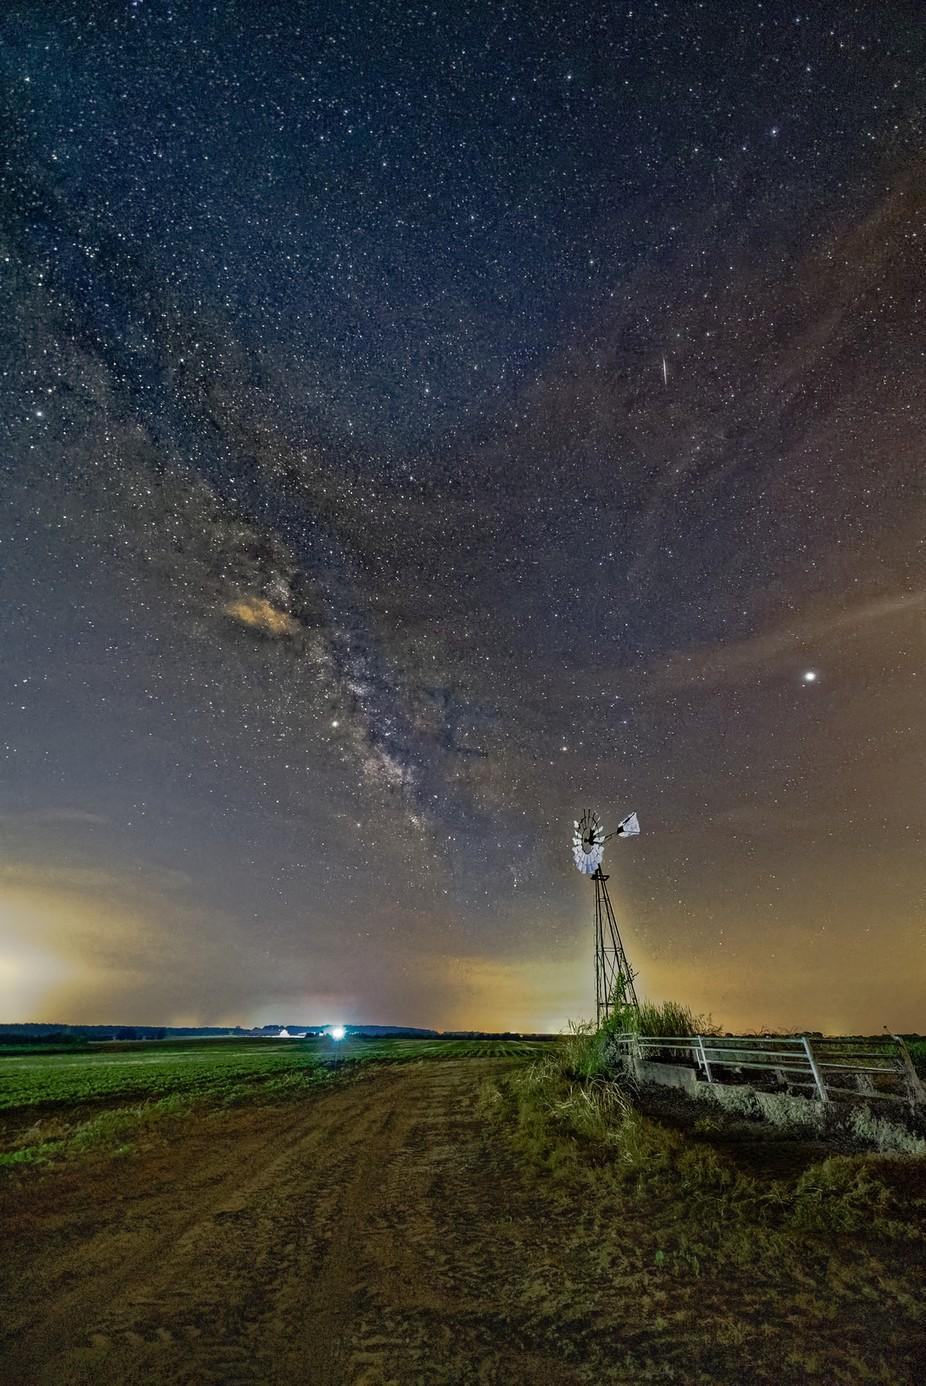 Milky Way Nightlight by auxgen4 - Capture The Milky Way Photo Contest